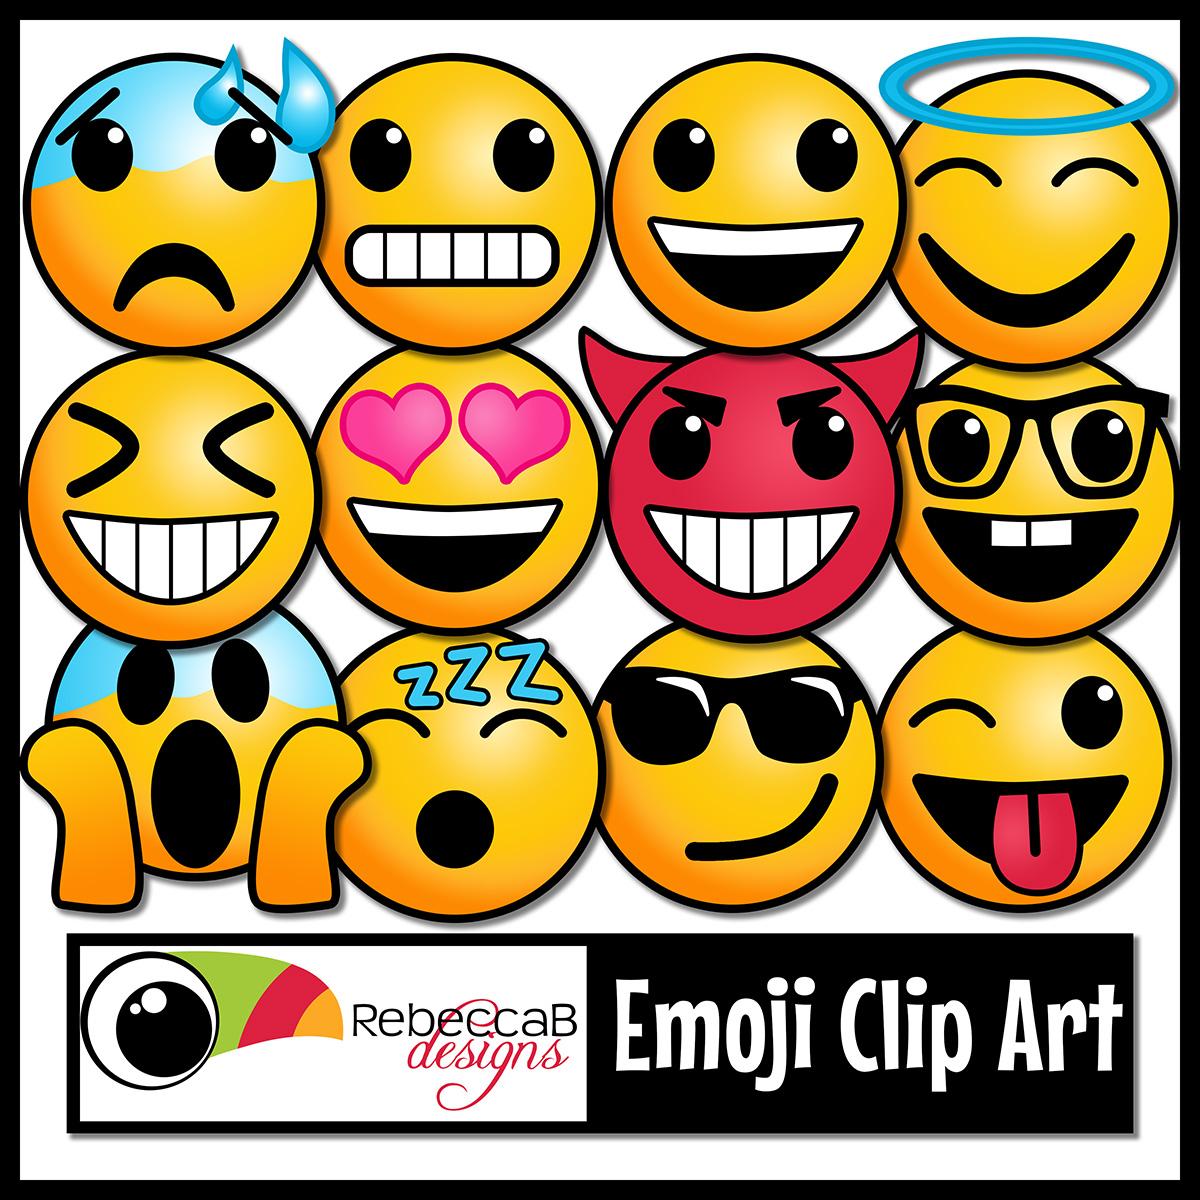 rebeccab designs free clip art free poop envy or puke and money emojis